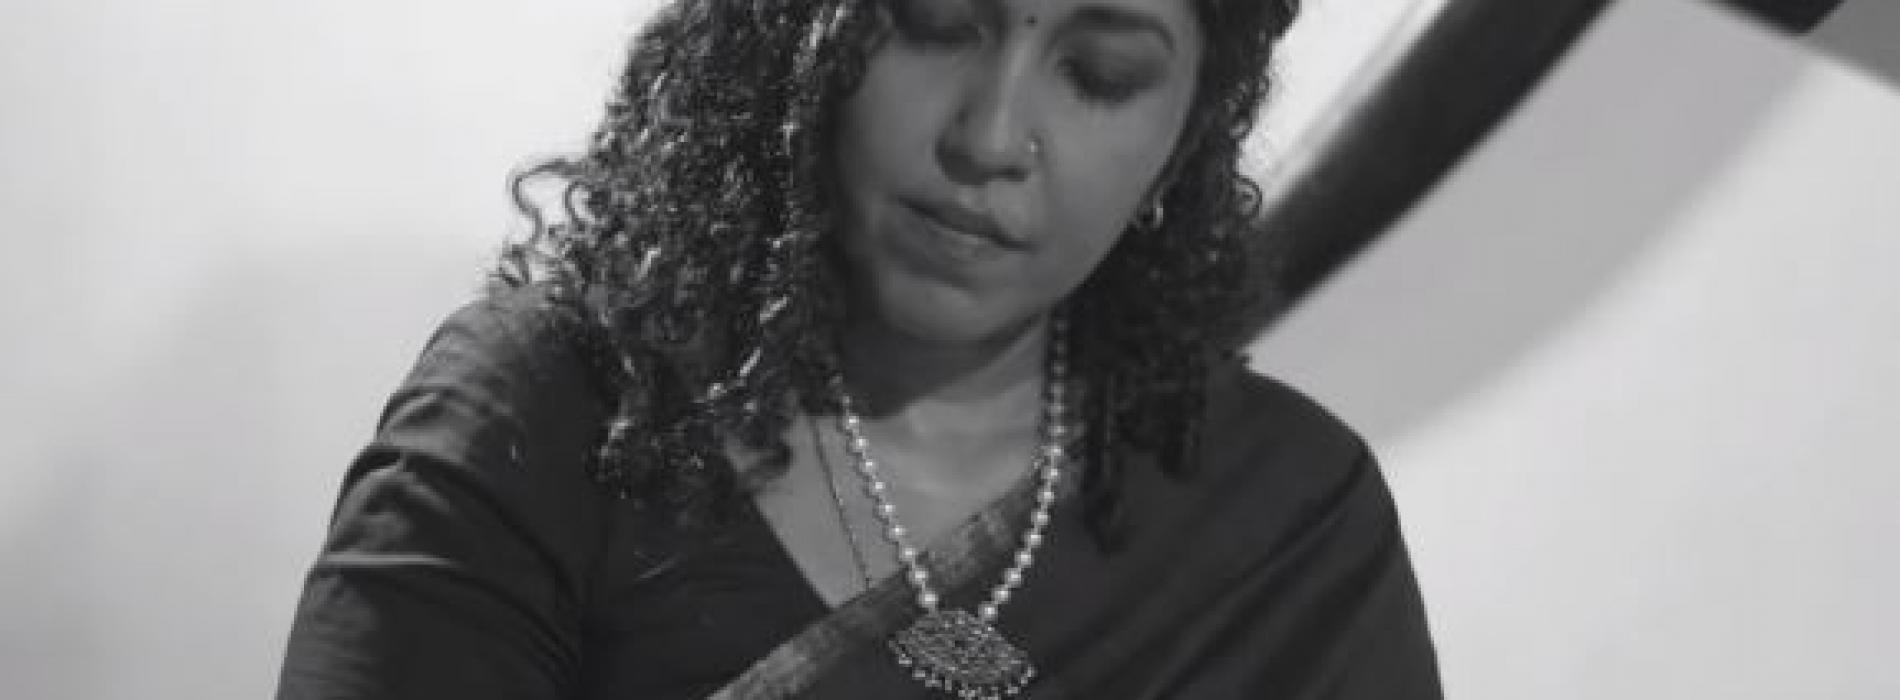 Variations On A Theme By Ilaiyaraajah (Mouna Raagam) – Arranged By Soundarie David Rodrigo